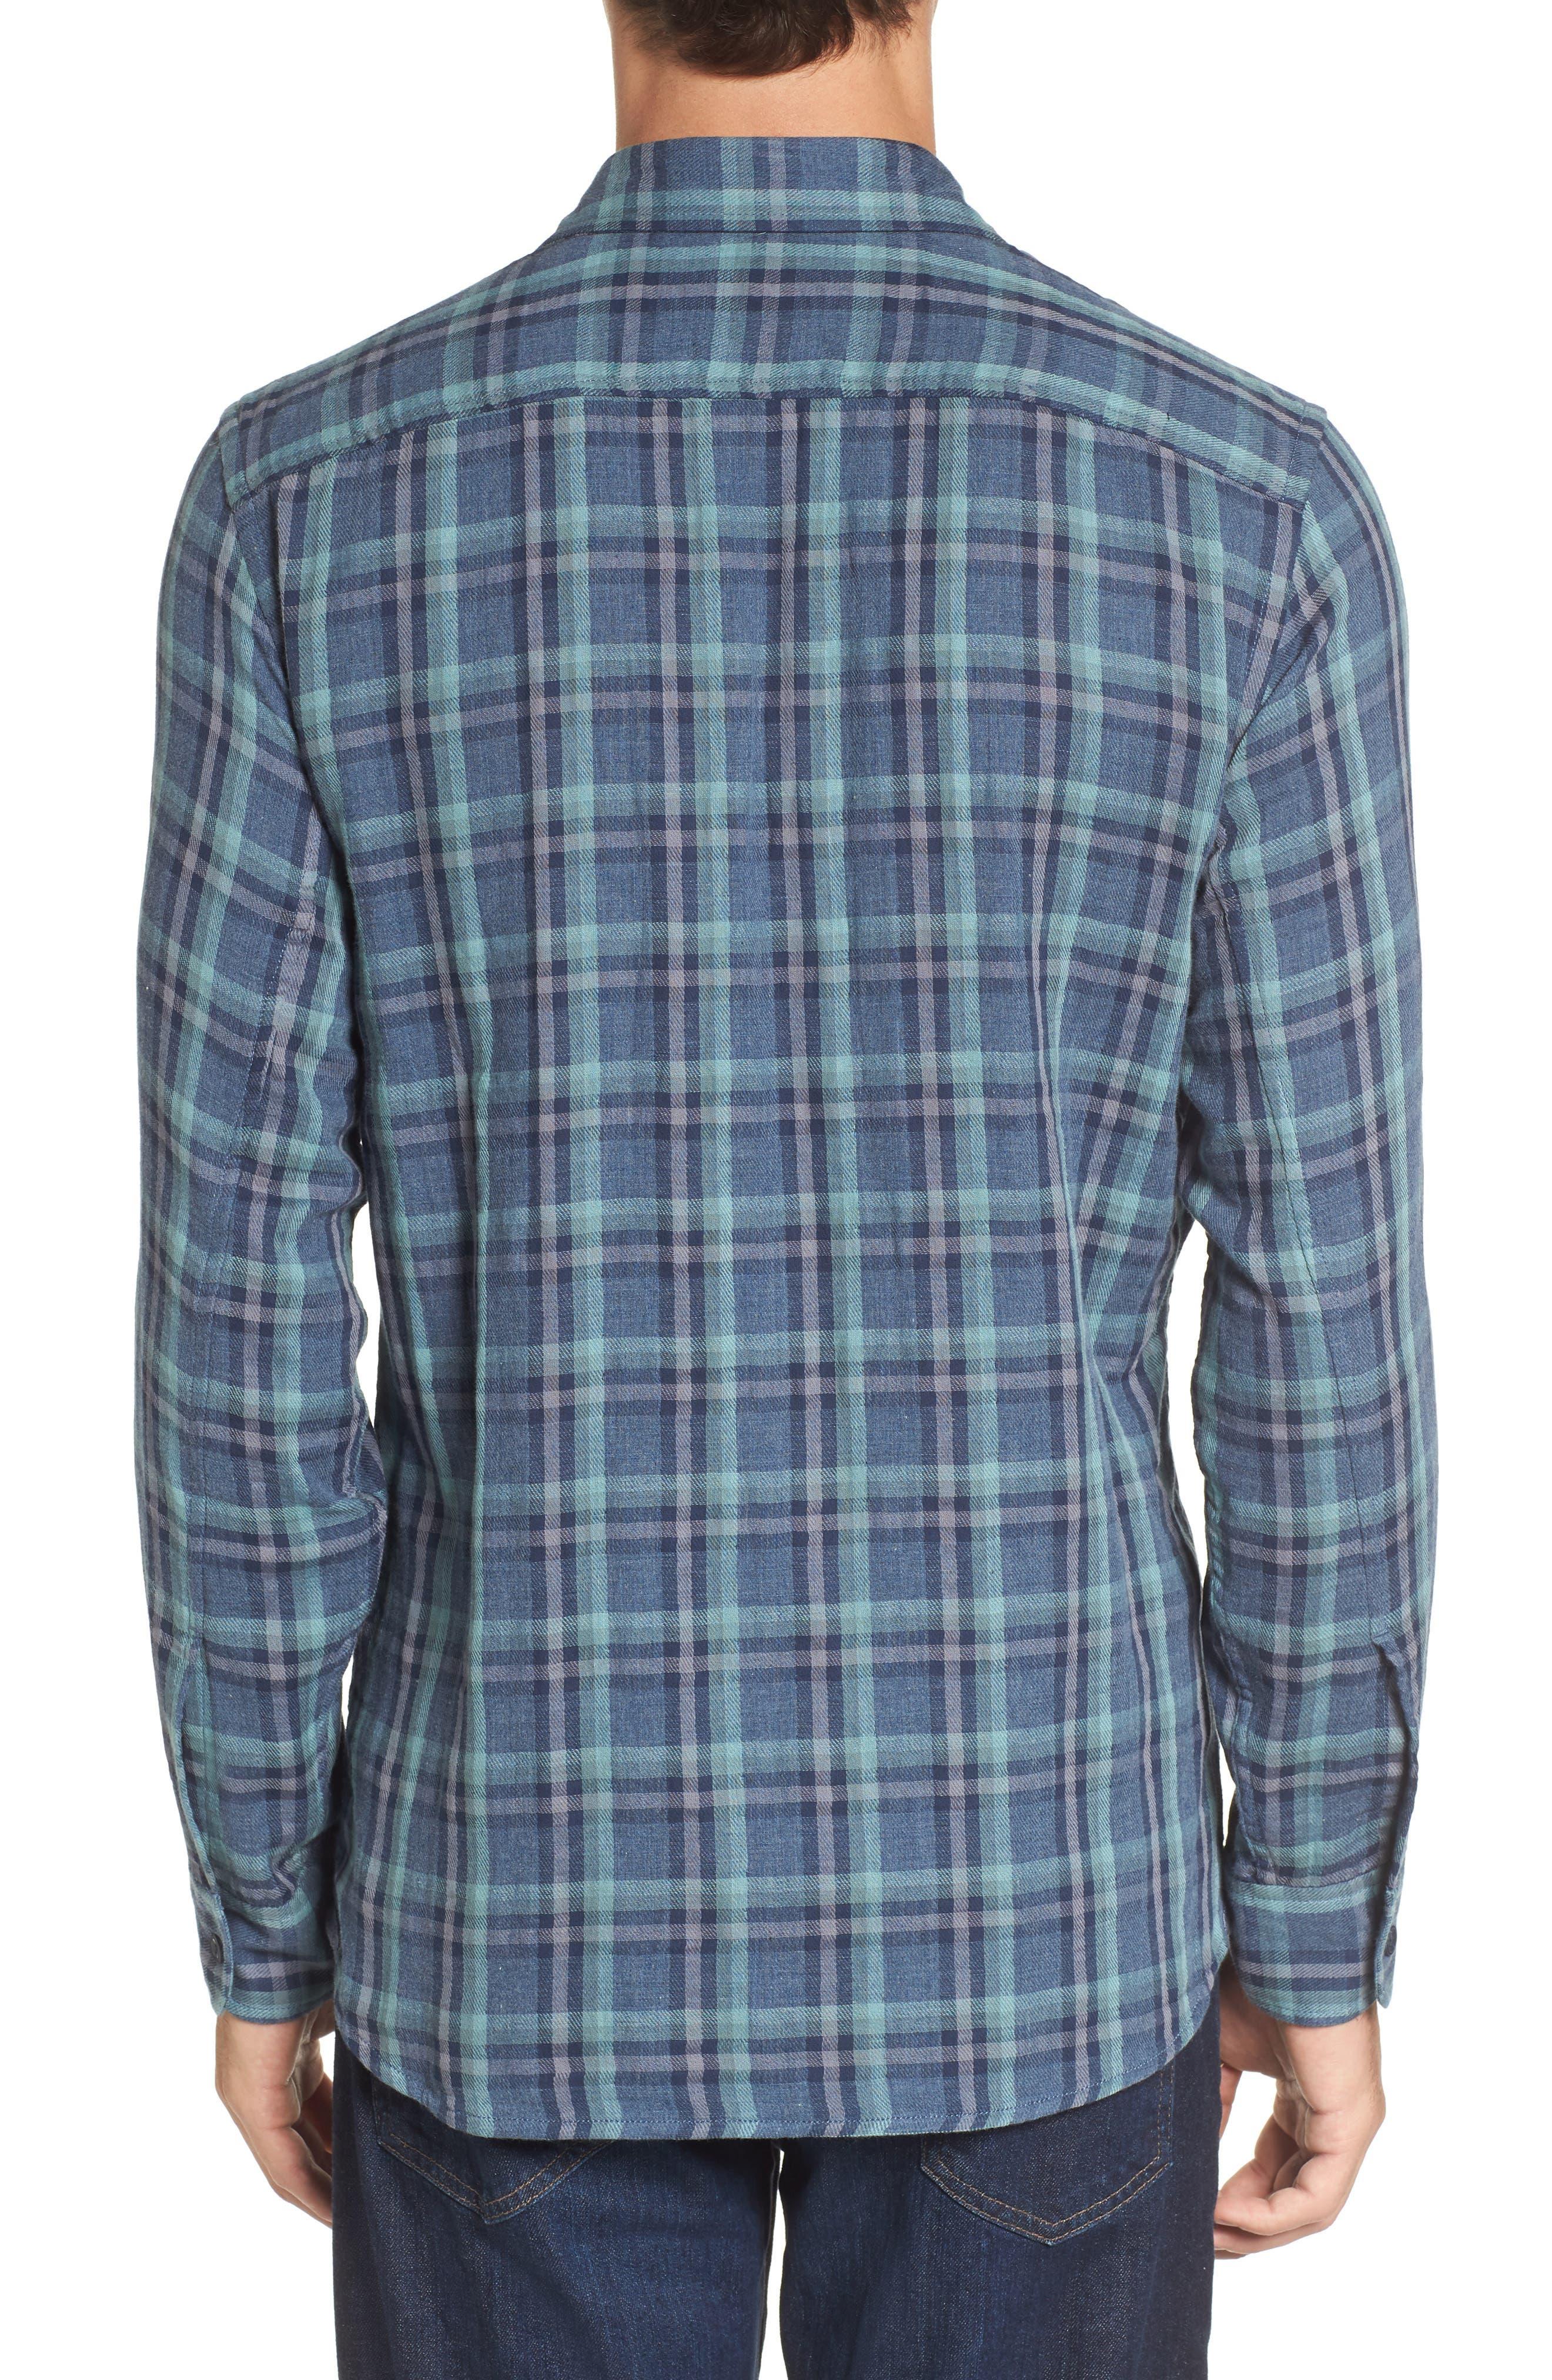 Smith Double Cloth Plaid Sport Shirt,                             Alternate thumbnail 2, color,